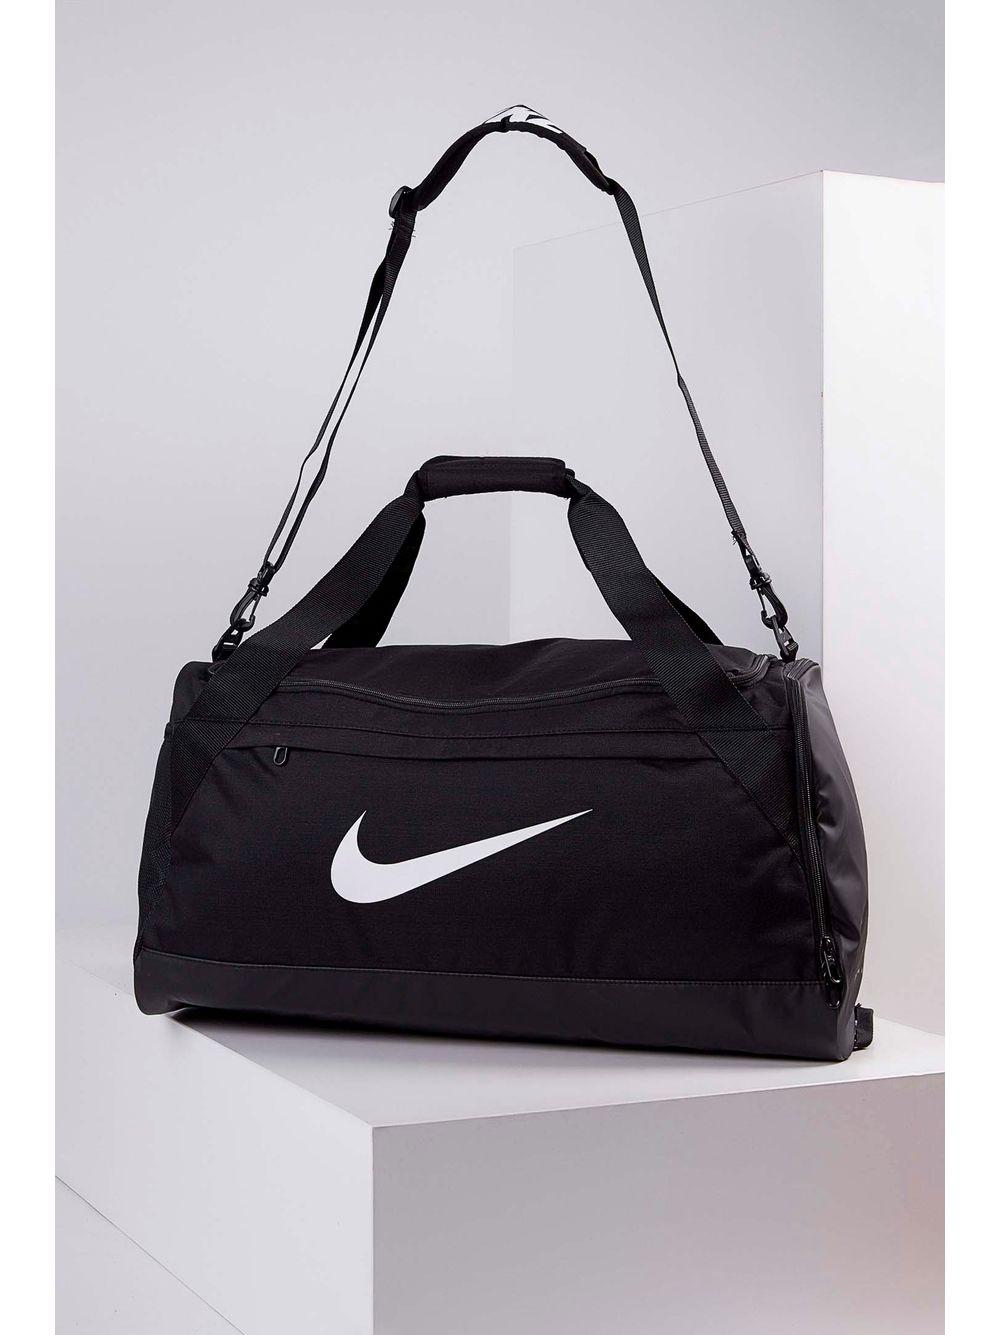 a05749e13 Bolsa Mala Nike Academia Brasilia Preto - pittol